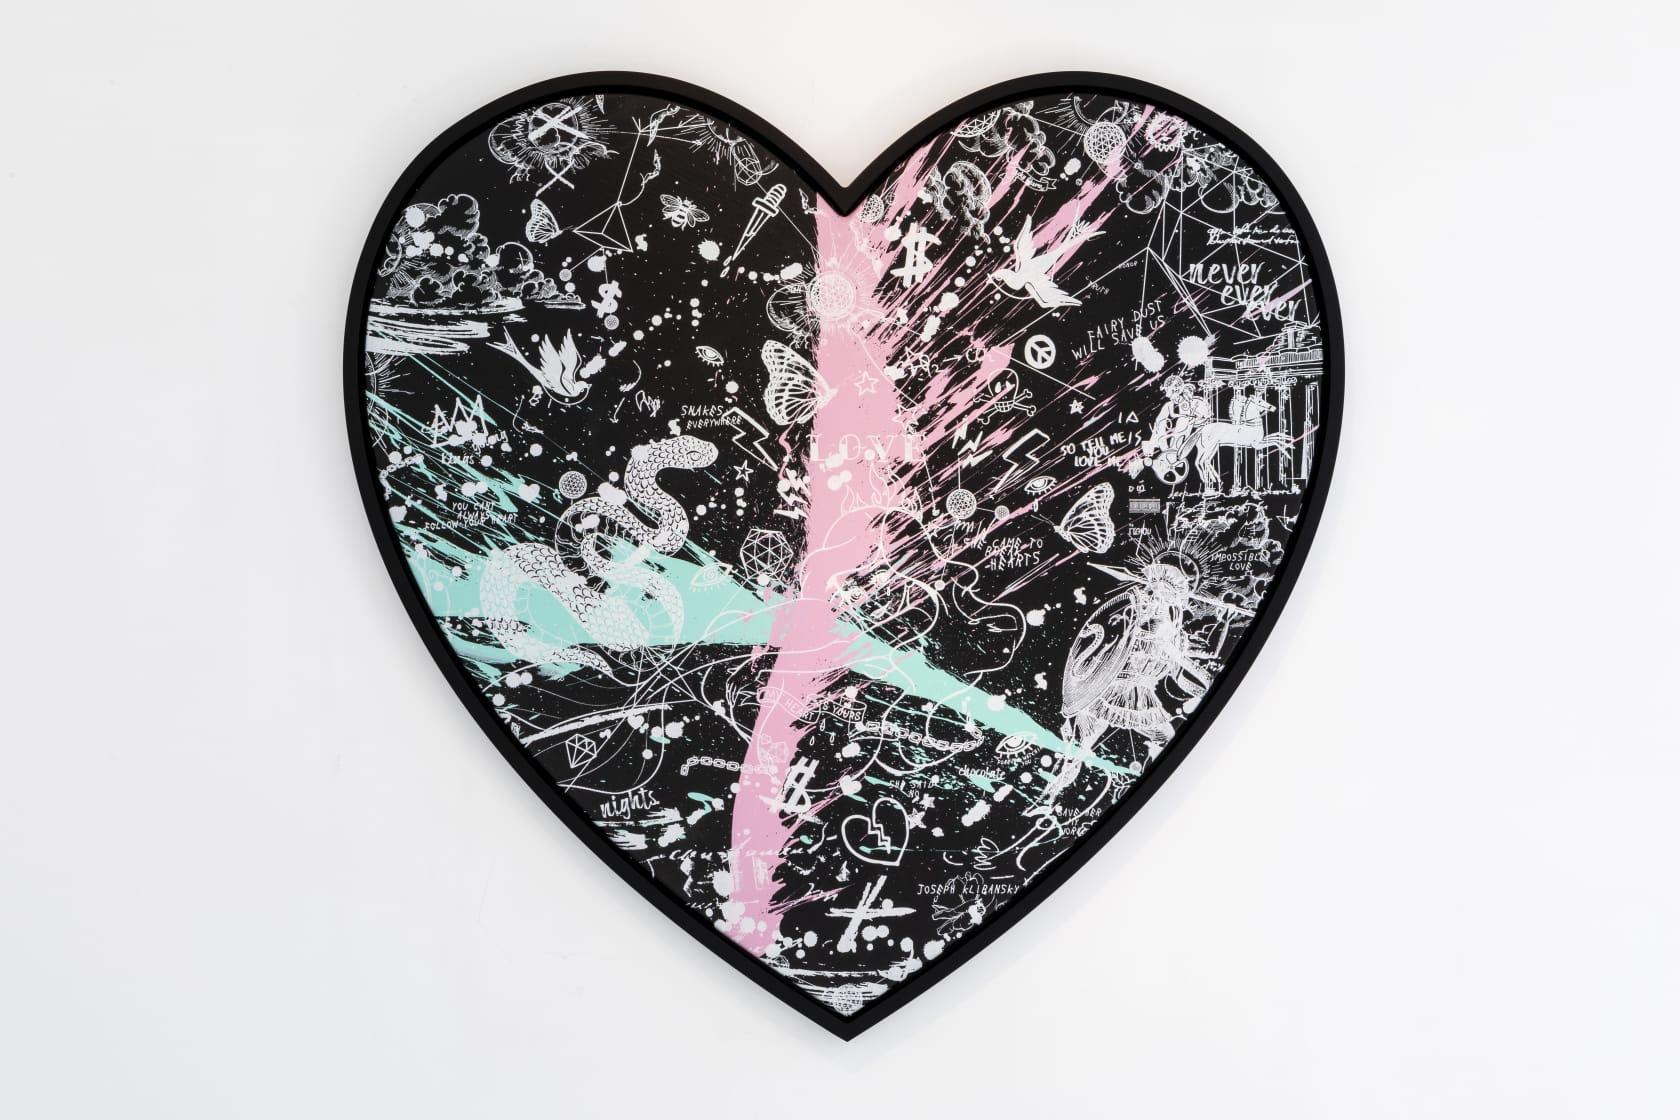 Joseph Klibansky, She Came to Break Hearts (Black/White, Pastel Pink and Turquoise Splash), 2020